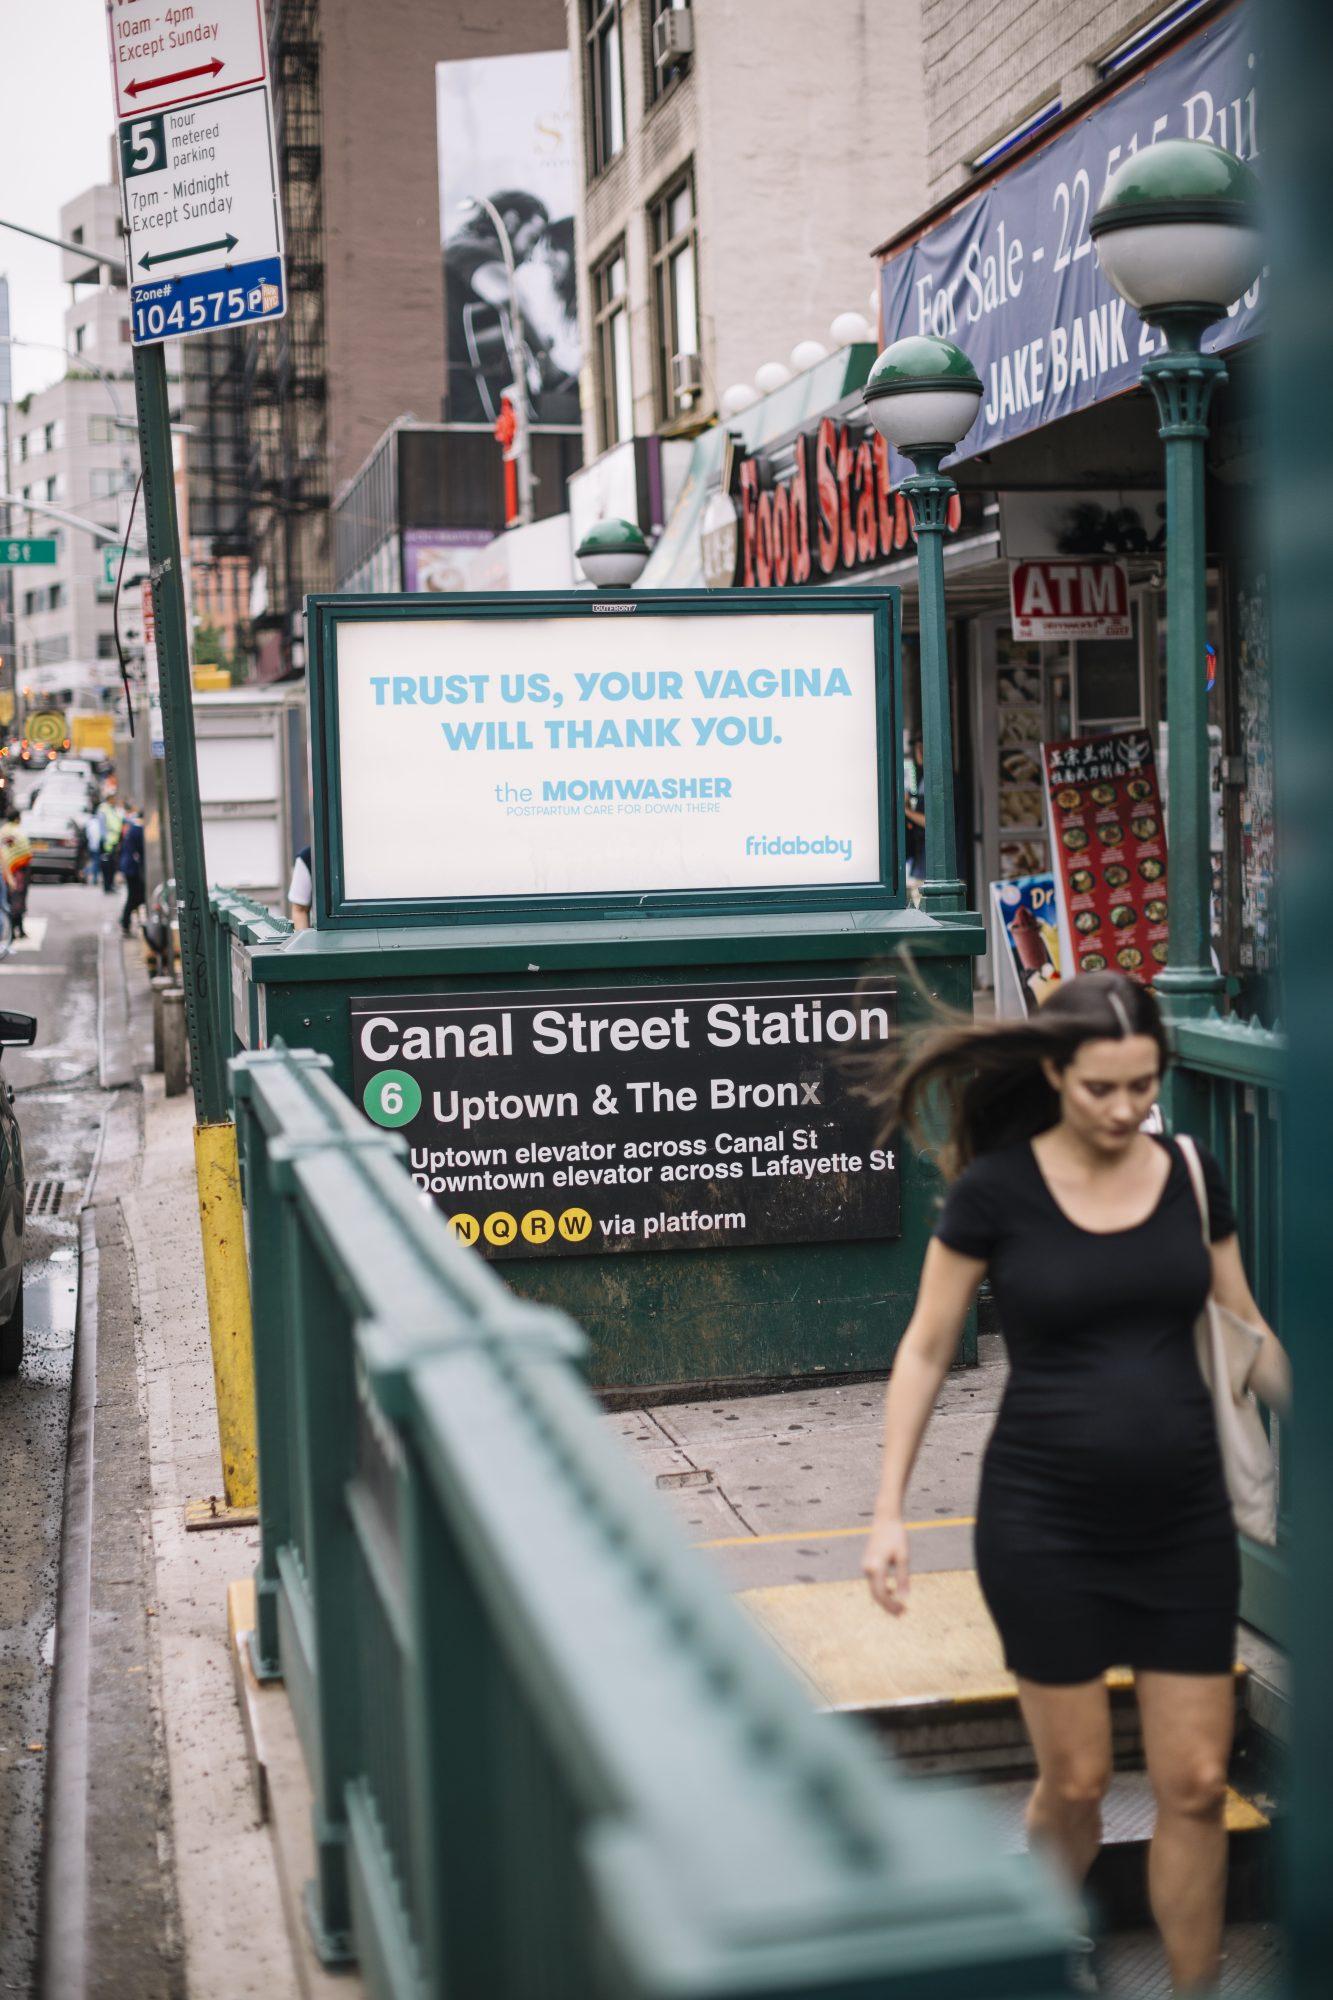 billboardpost.jpg